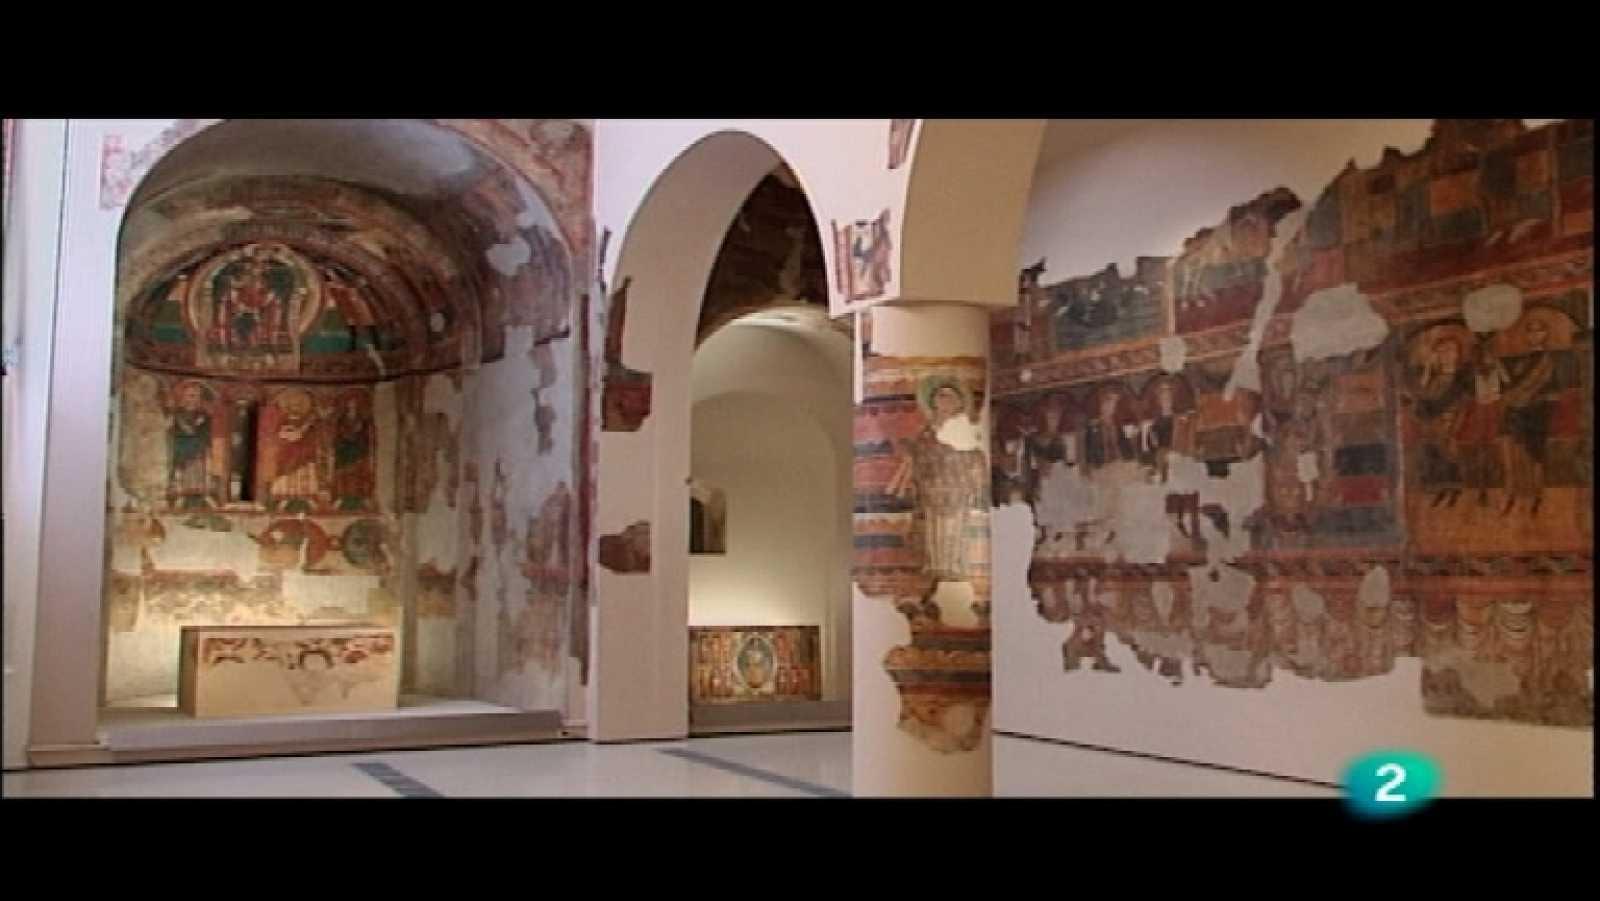 La mitad invisible - El Pantocrátor de Sant Climent de Taüll - Ver ahora